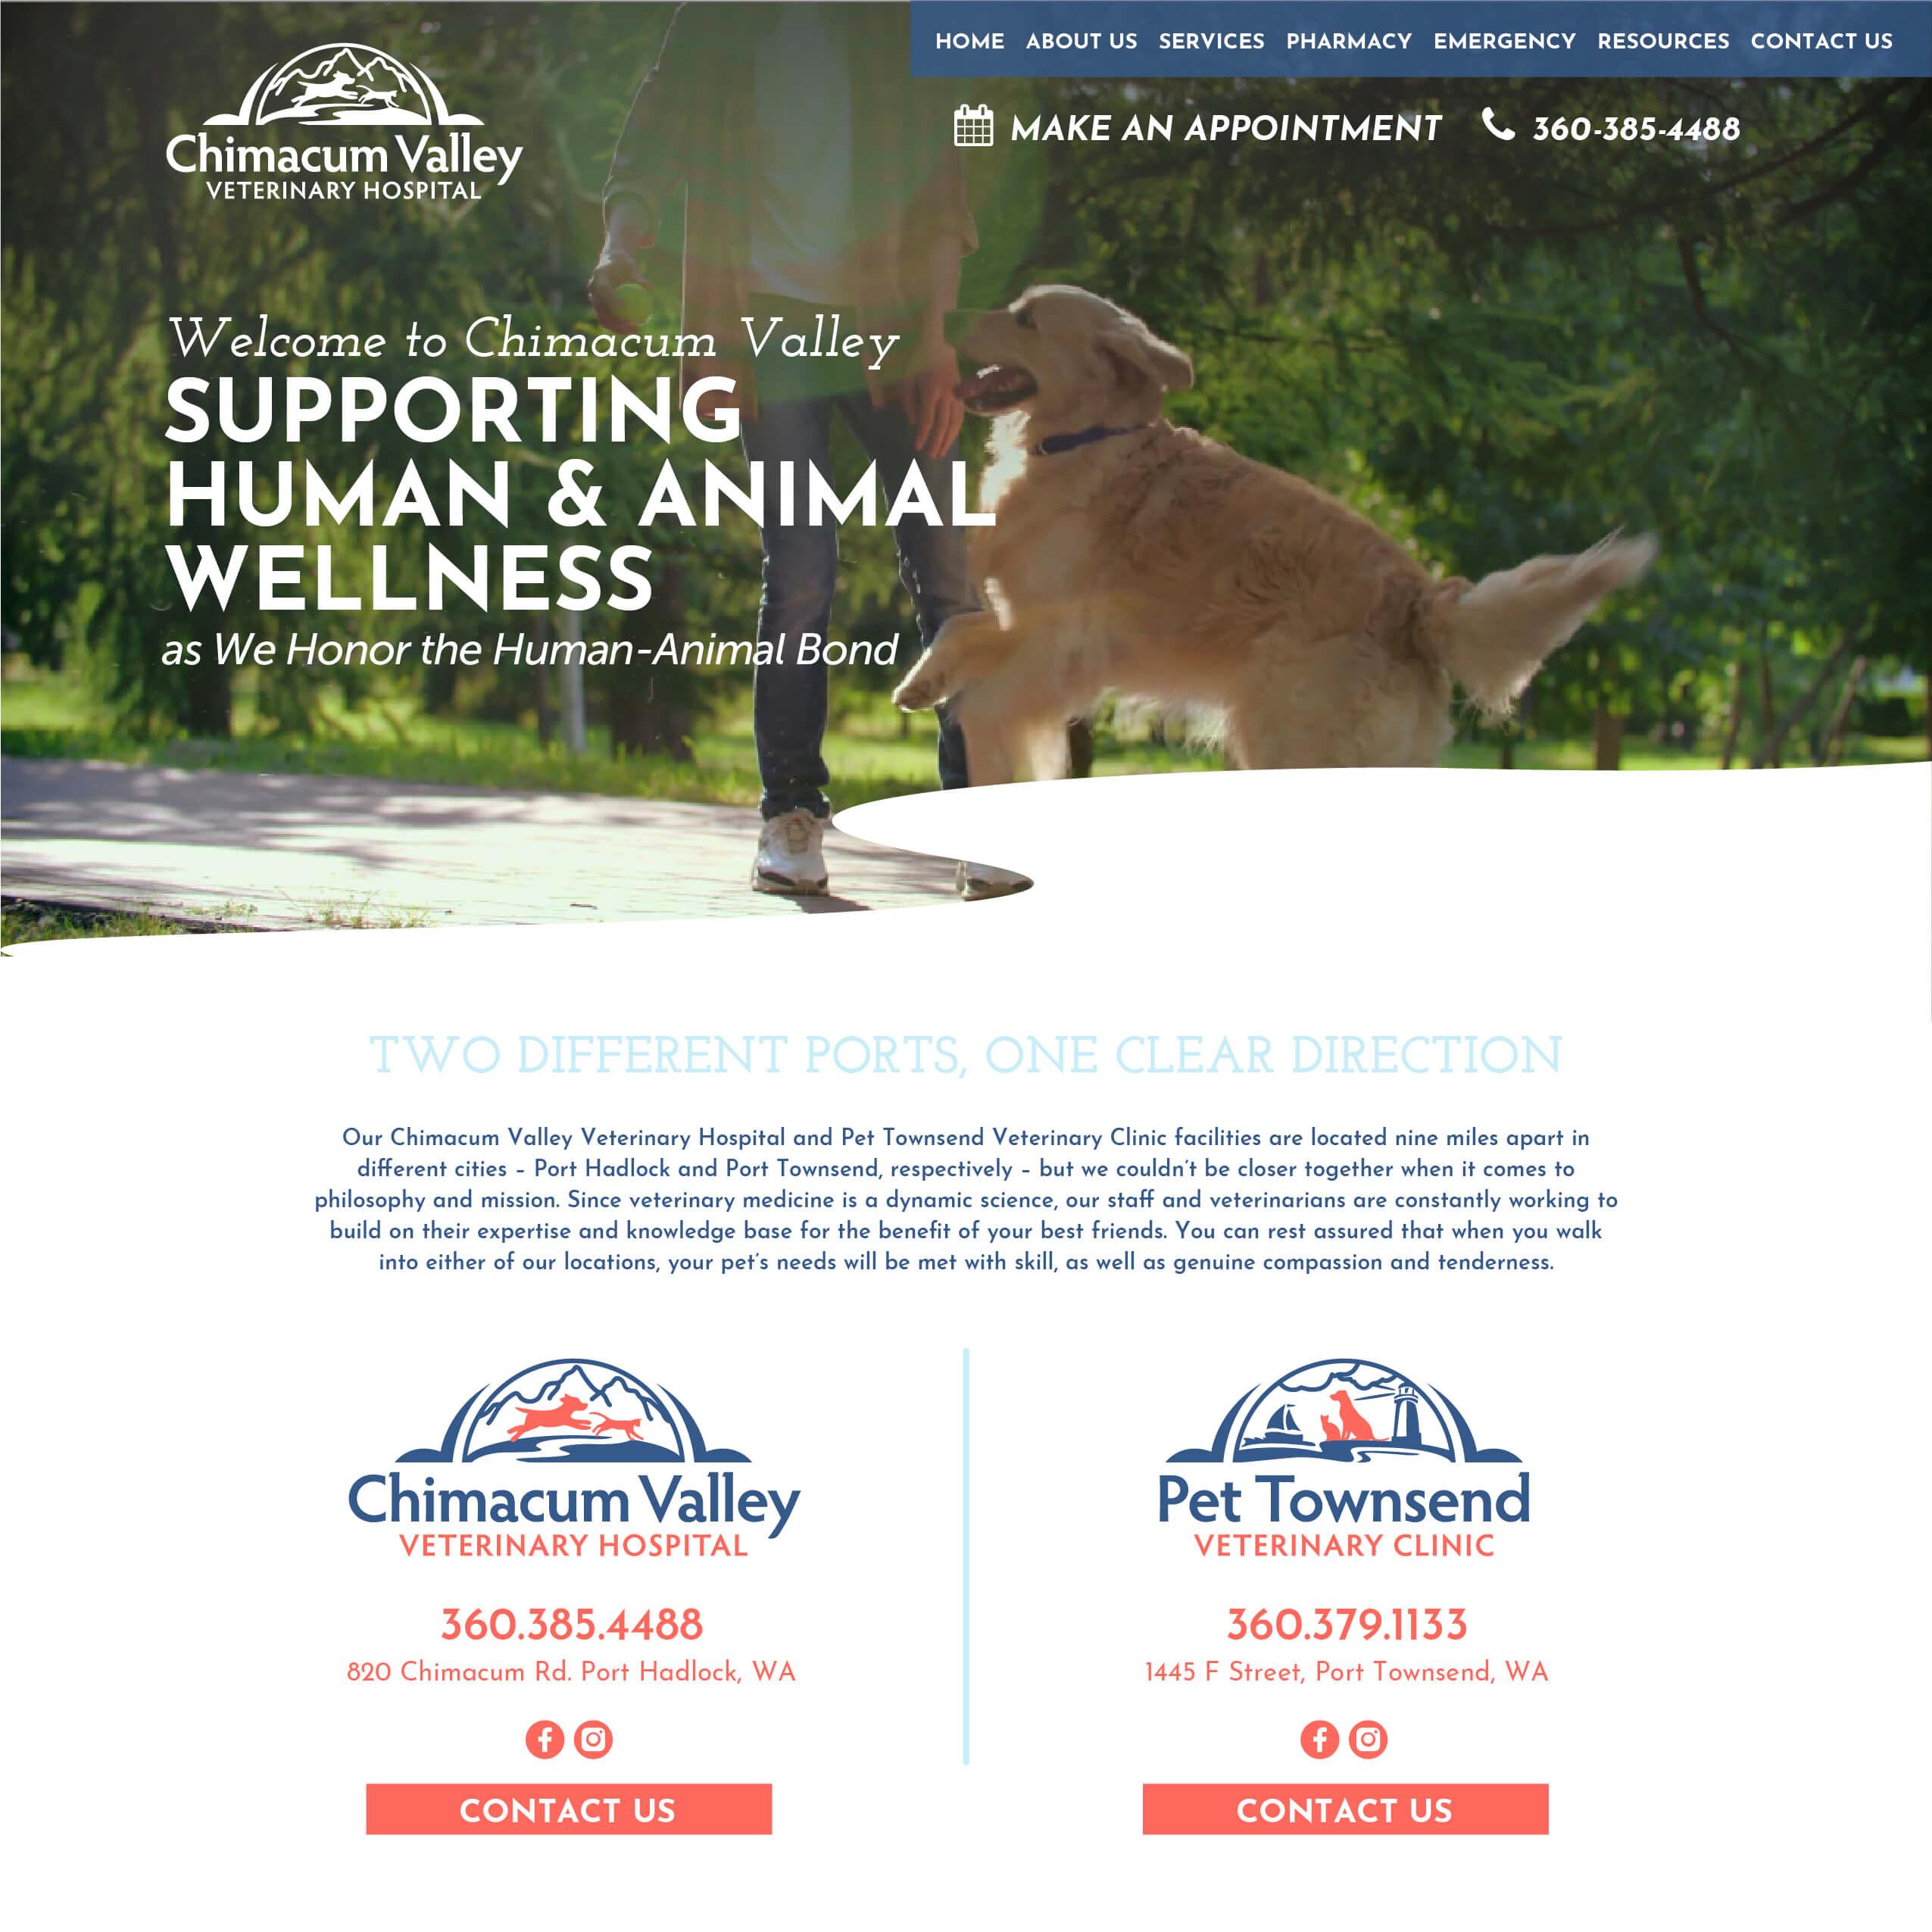 Chimacum Valley Veterinary Hospital